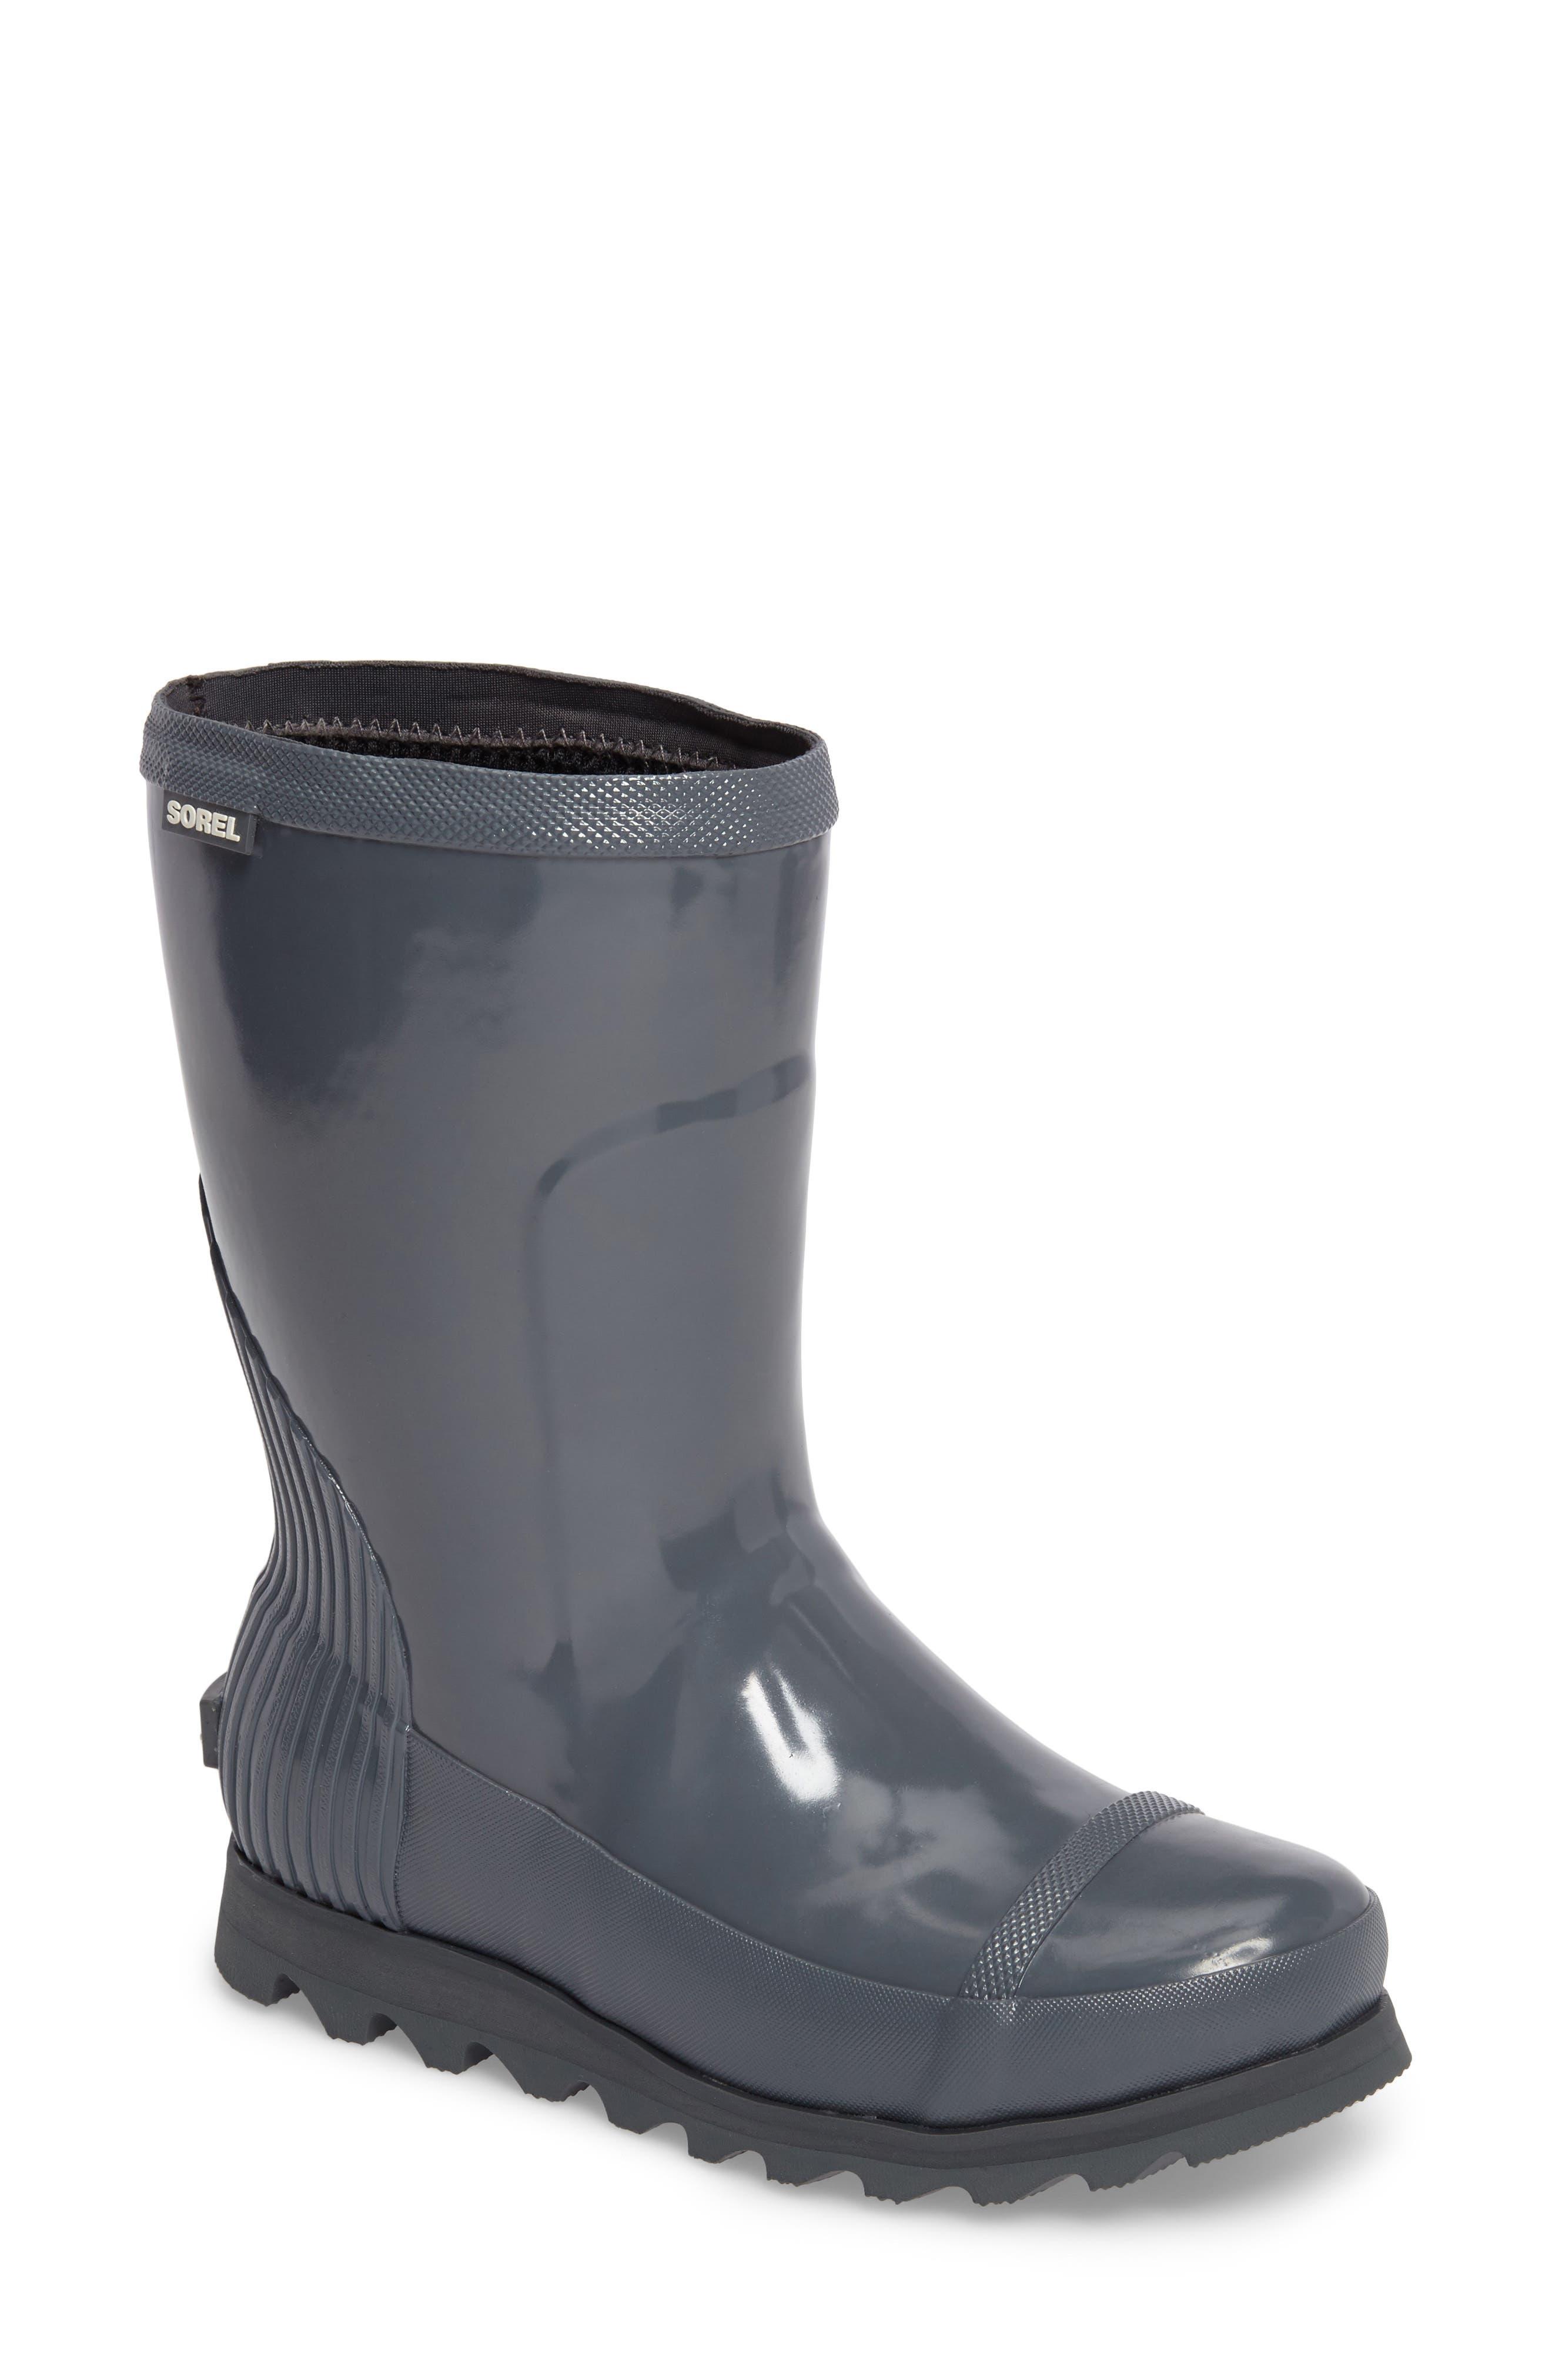 Main Image - SOREL Joan Glossy Short Rain Boot (Women)